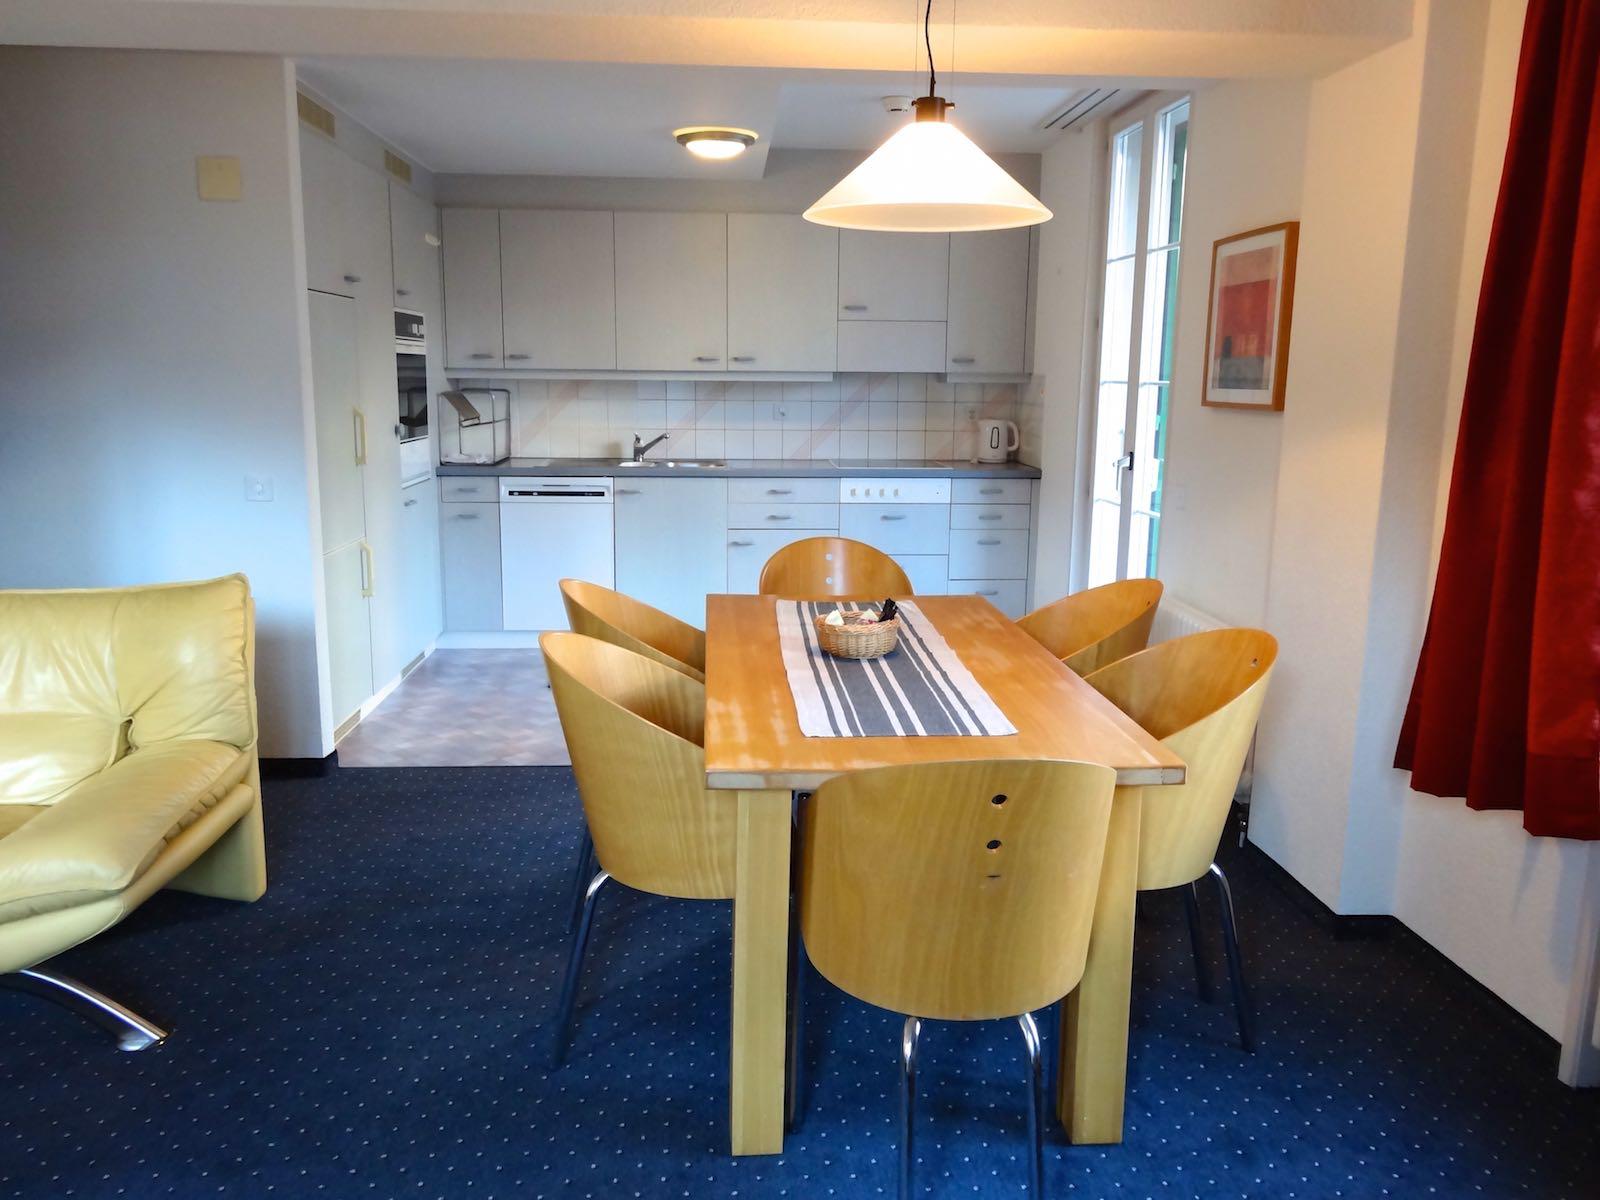 http://hoteljungfrau.ch/wp-content/uploads/2014/11/hotel-apartment-9.jpg